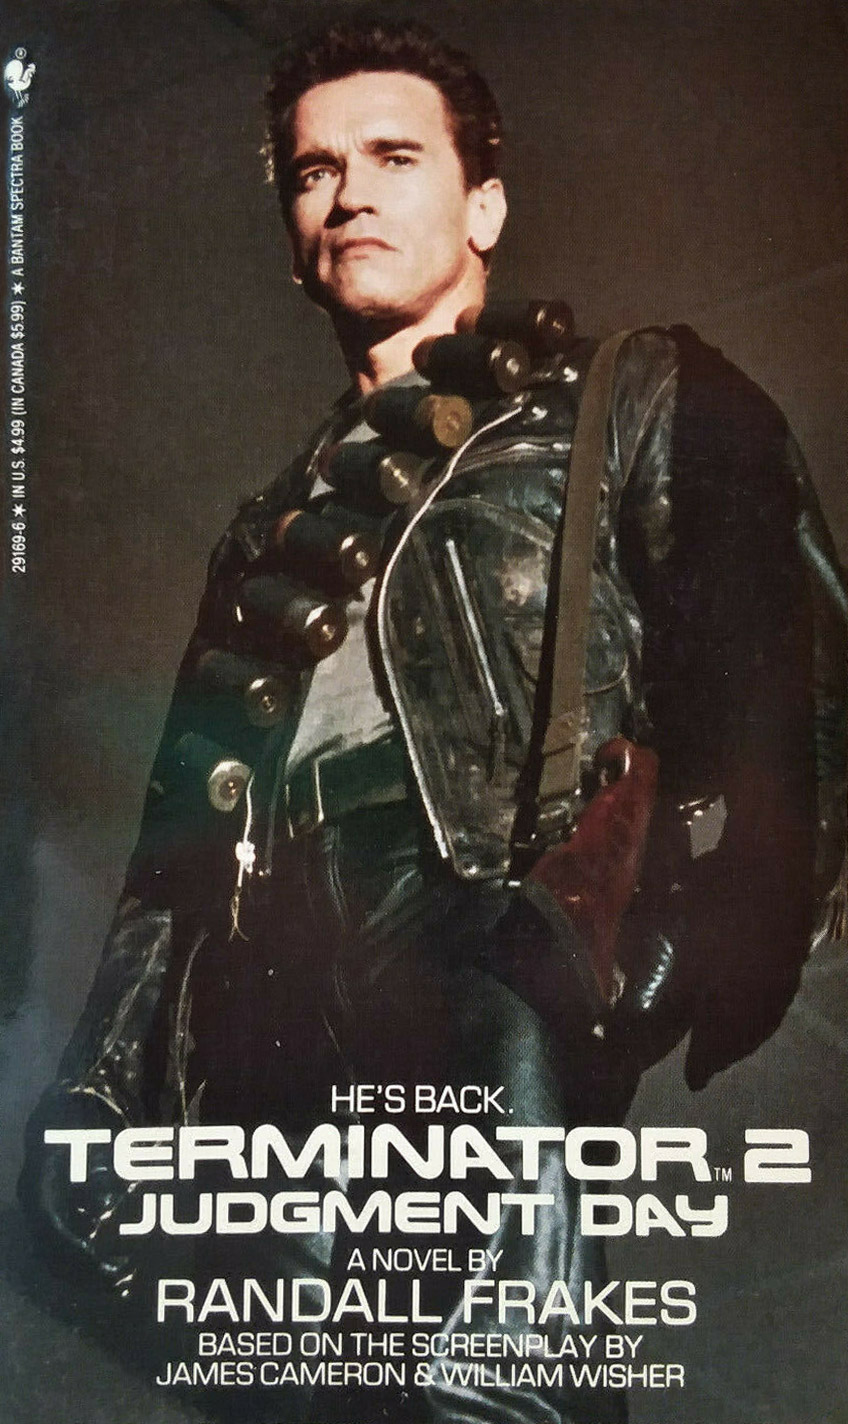 Terminator 2: Judgment Day (novel)